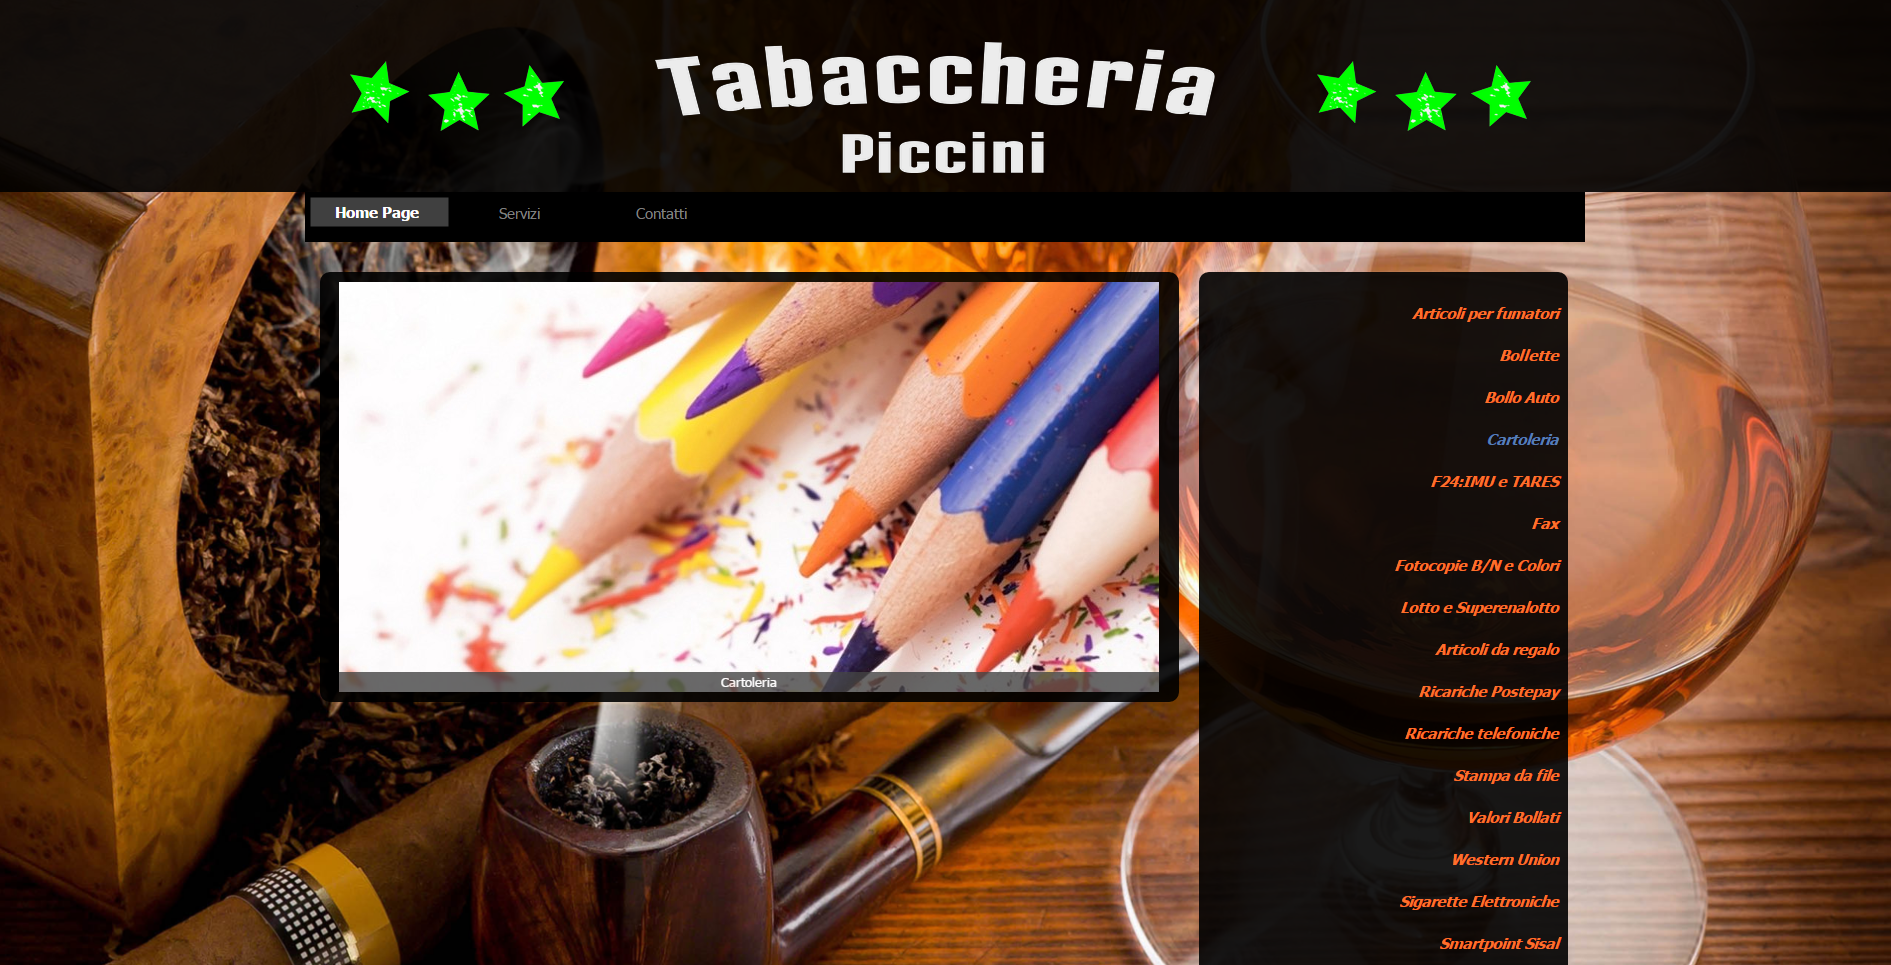 Tabaccheriapiccini.it